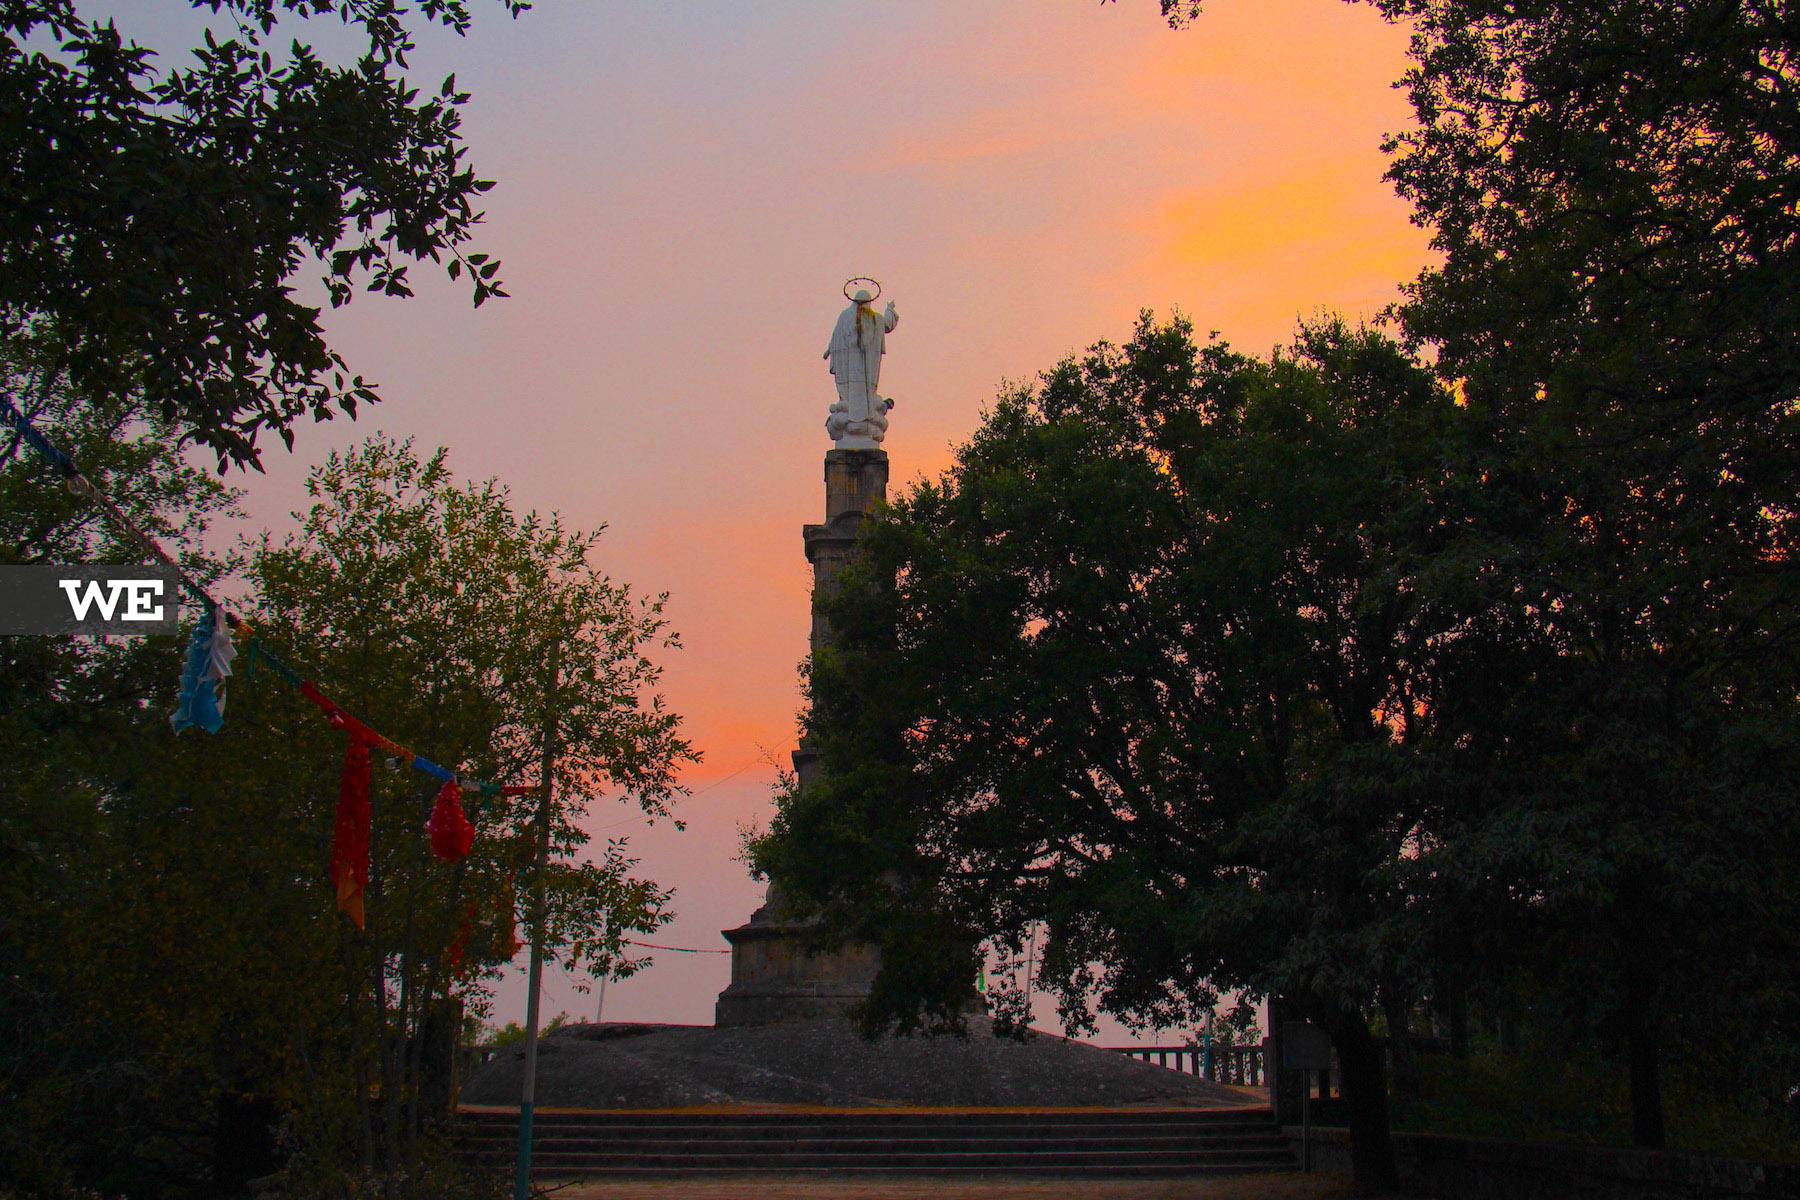 Miradouro de Santa Marta das Cortiças, ao final da tarde. Vale a pena ver as vistas!